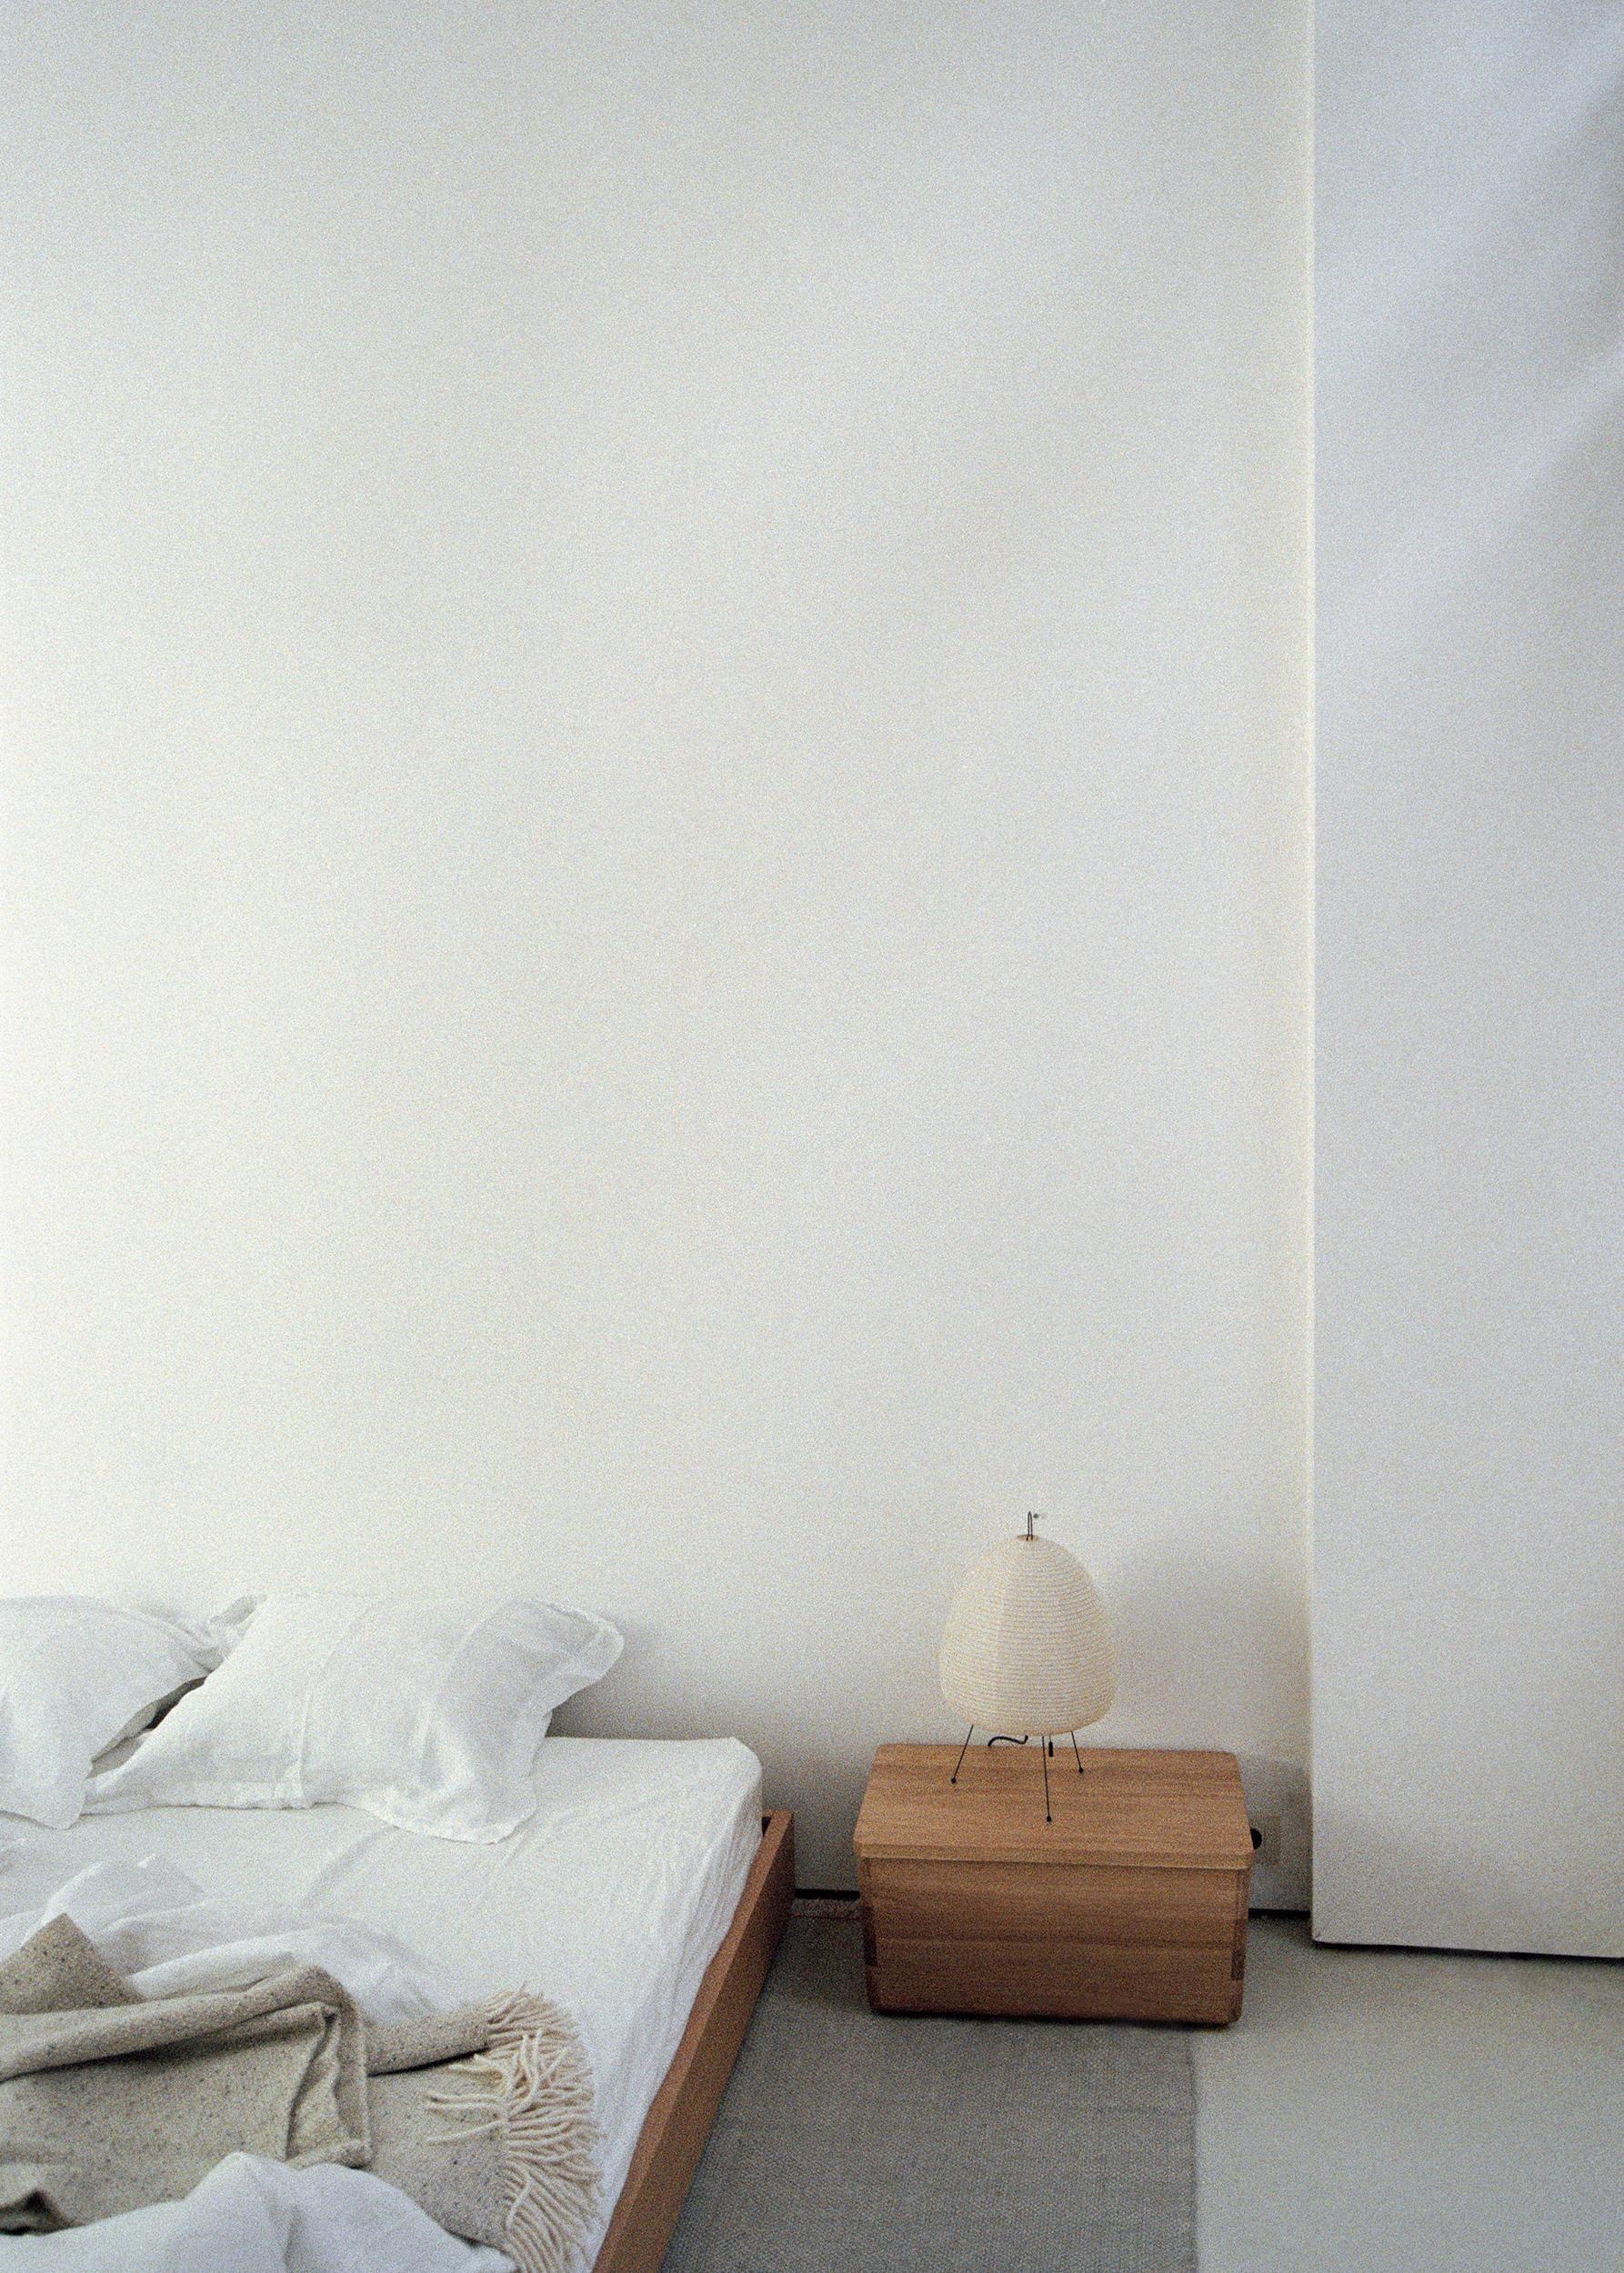 zinus bed frame instructions pdf